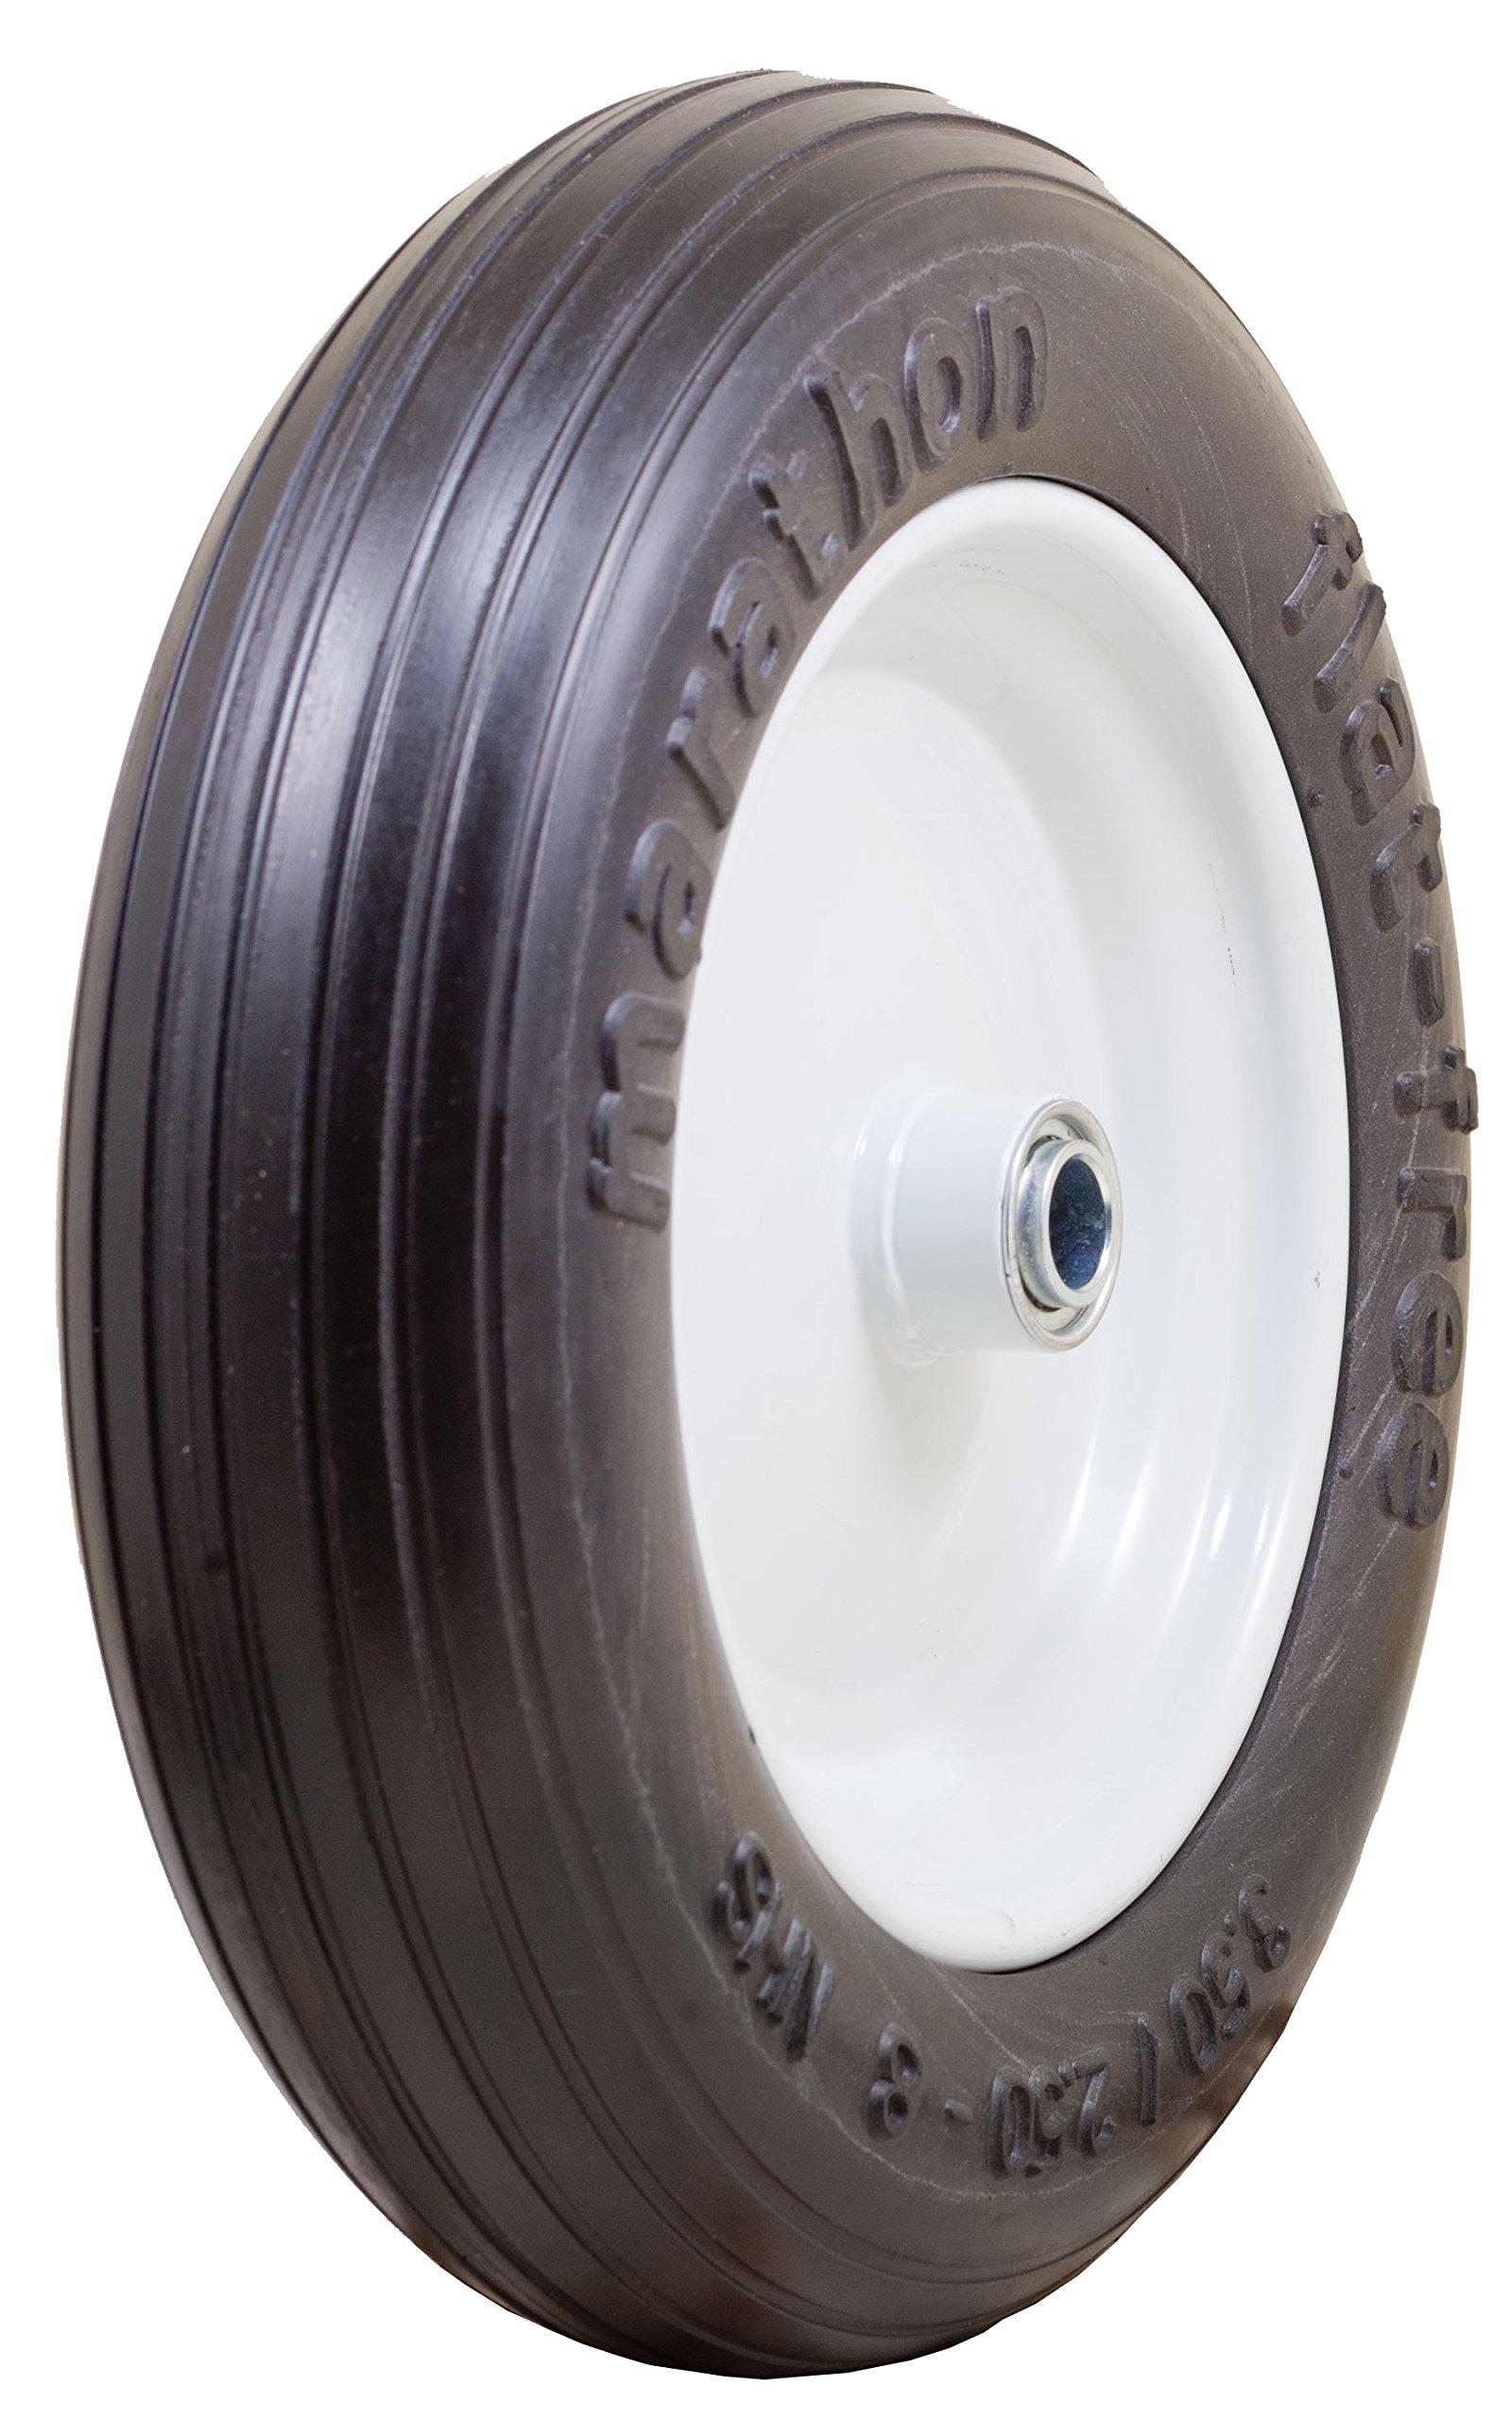 Marathon 3.50/2.50-8'' Flat Free Tire on Wheel, 3'' Centered Hub, 3/4'' Bearings by Marathon Industries